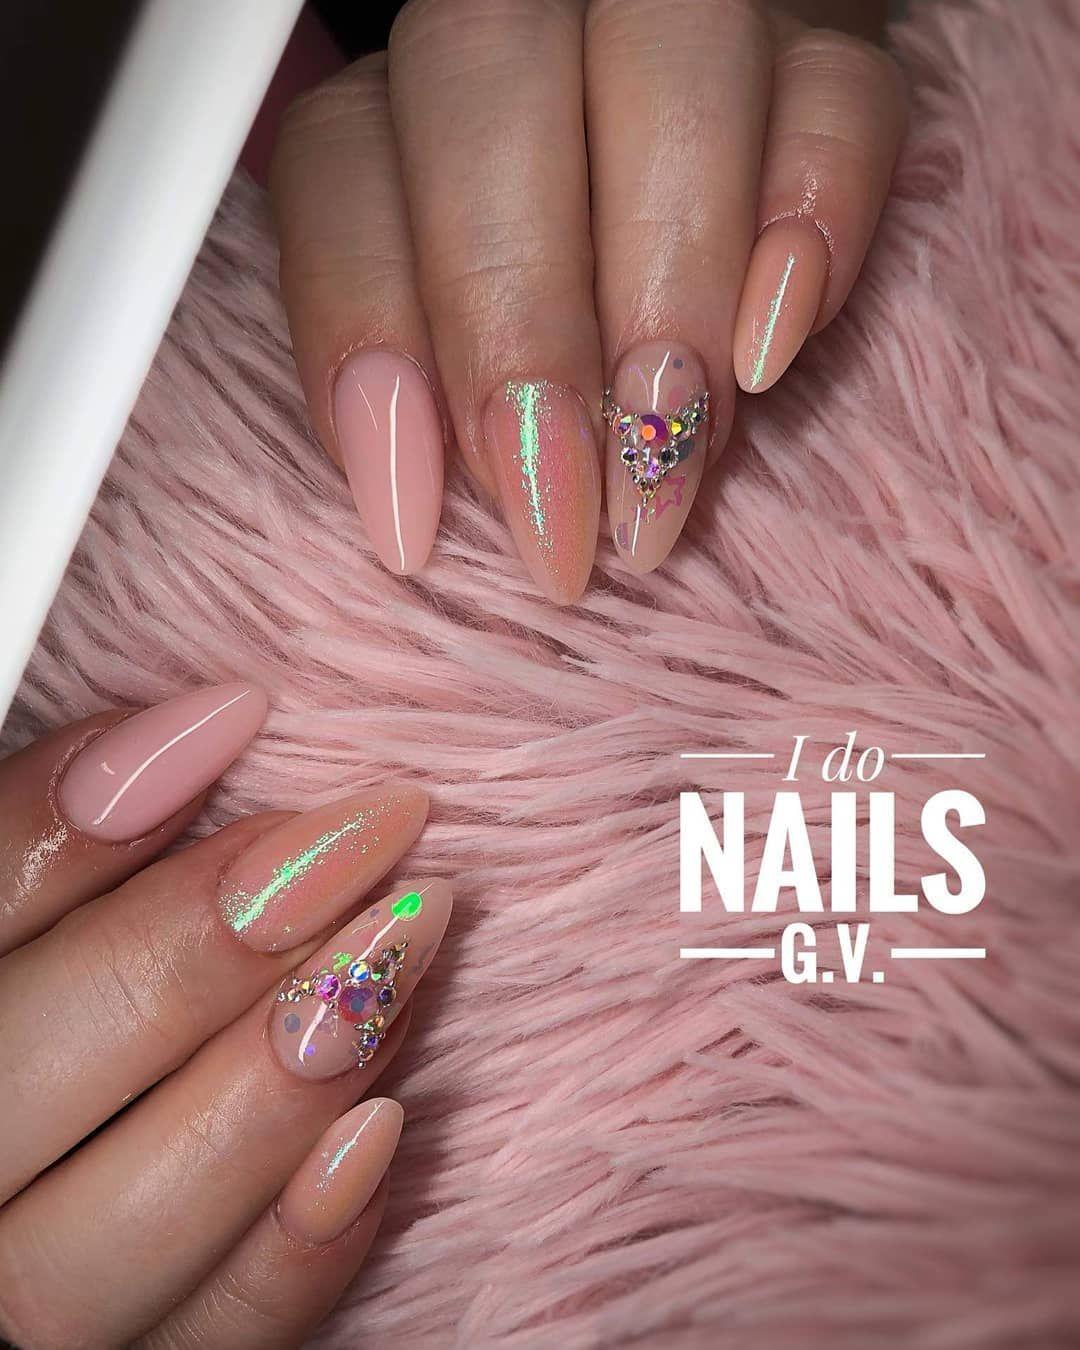 Luxusni Mlecne Nehty S Narural Pink Pro Trpytky Na Zalesteni Doporucim Fingers Glitters Green Gelove Nehty Gabriielaa Pinknails Pinknailsc Nails Beauty